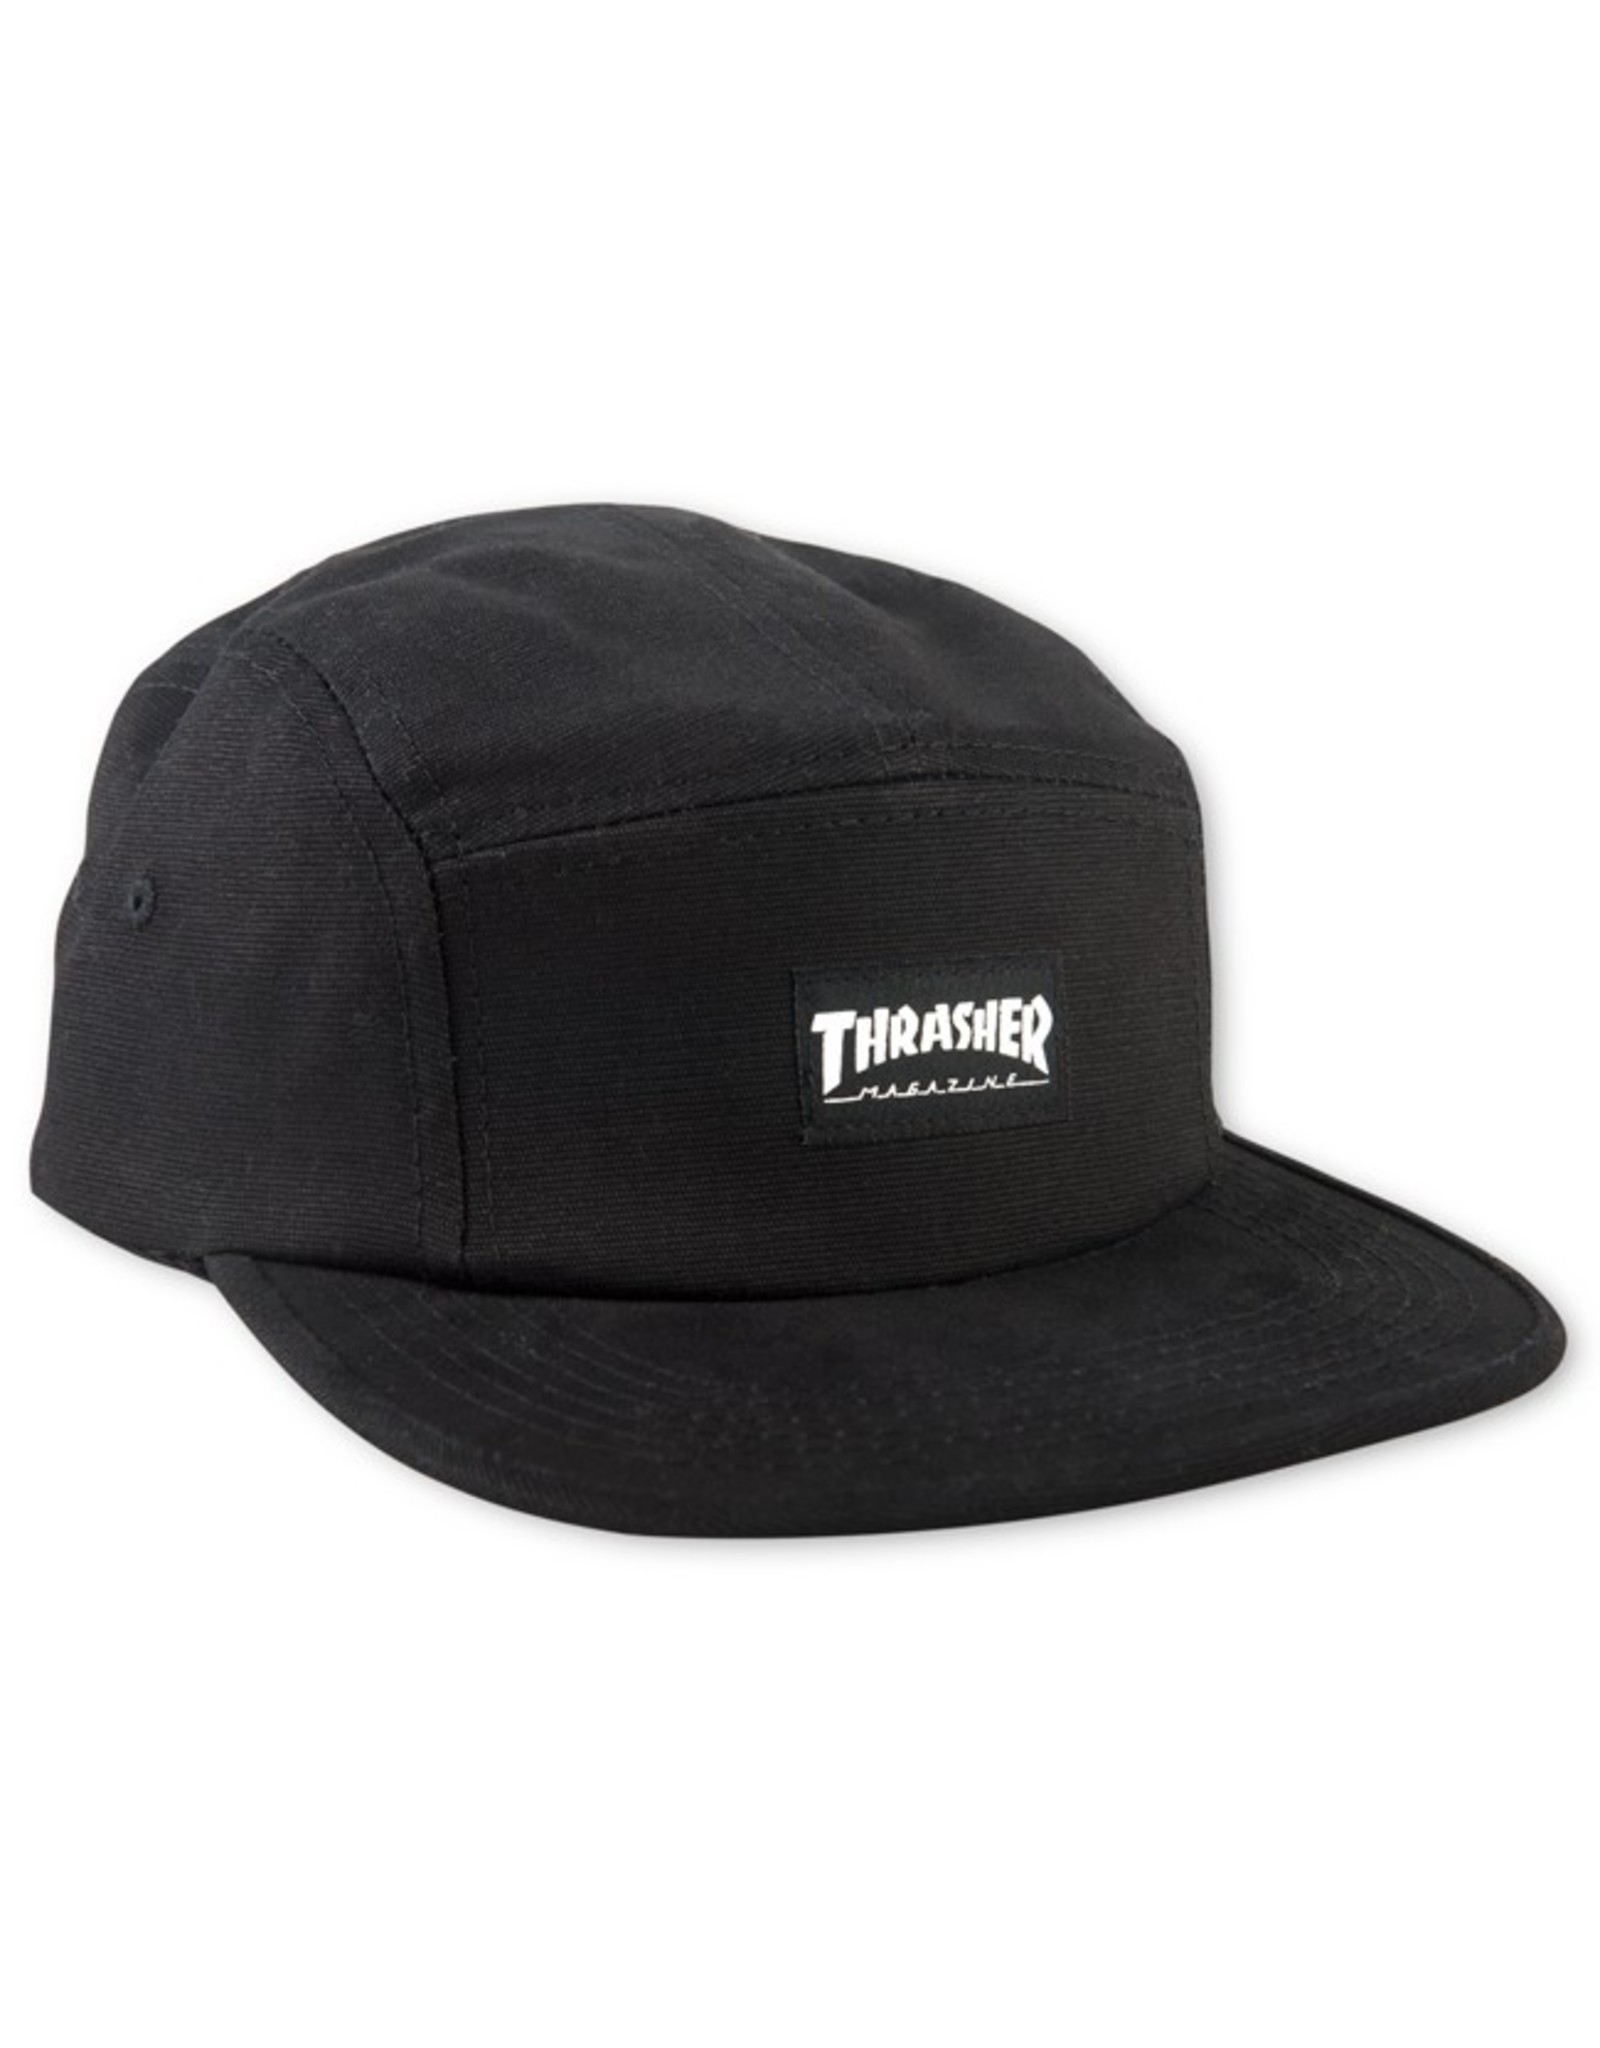 THRASHER THRASHER - 5-PANEL - BLACK